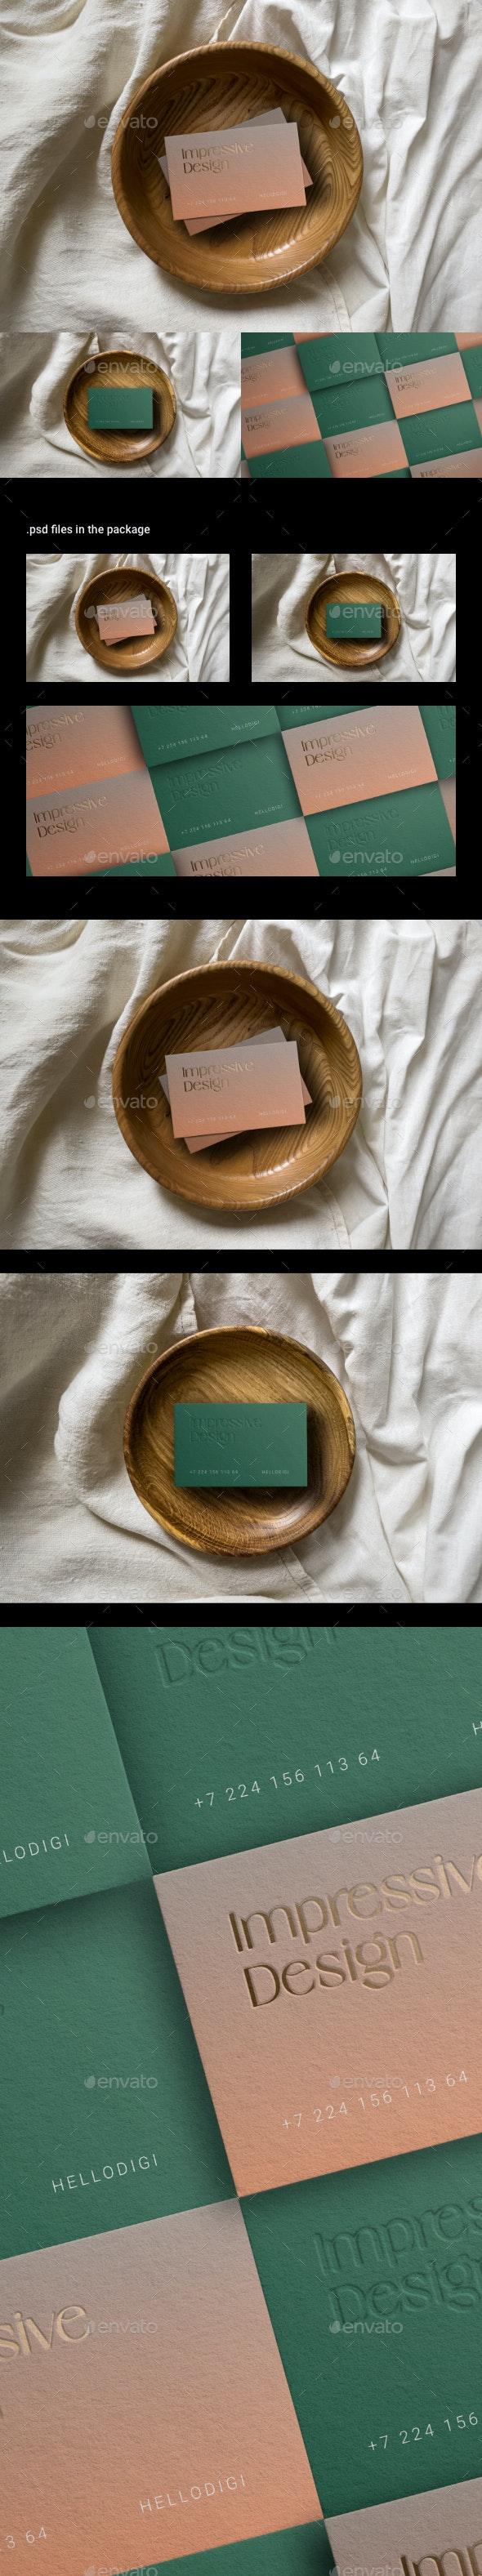 Business Card Mockup on Wooden Platter - Business Cards Print